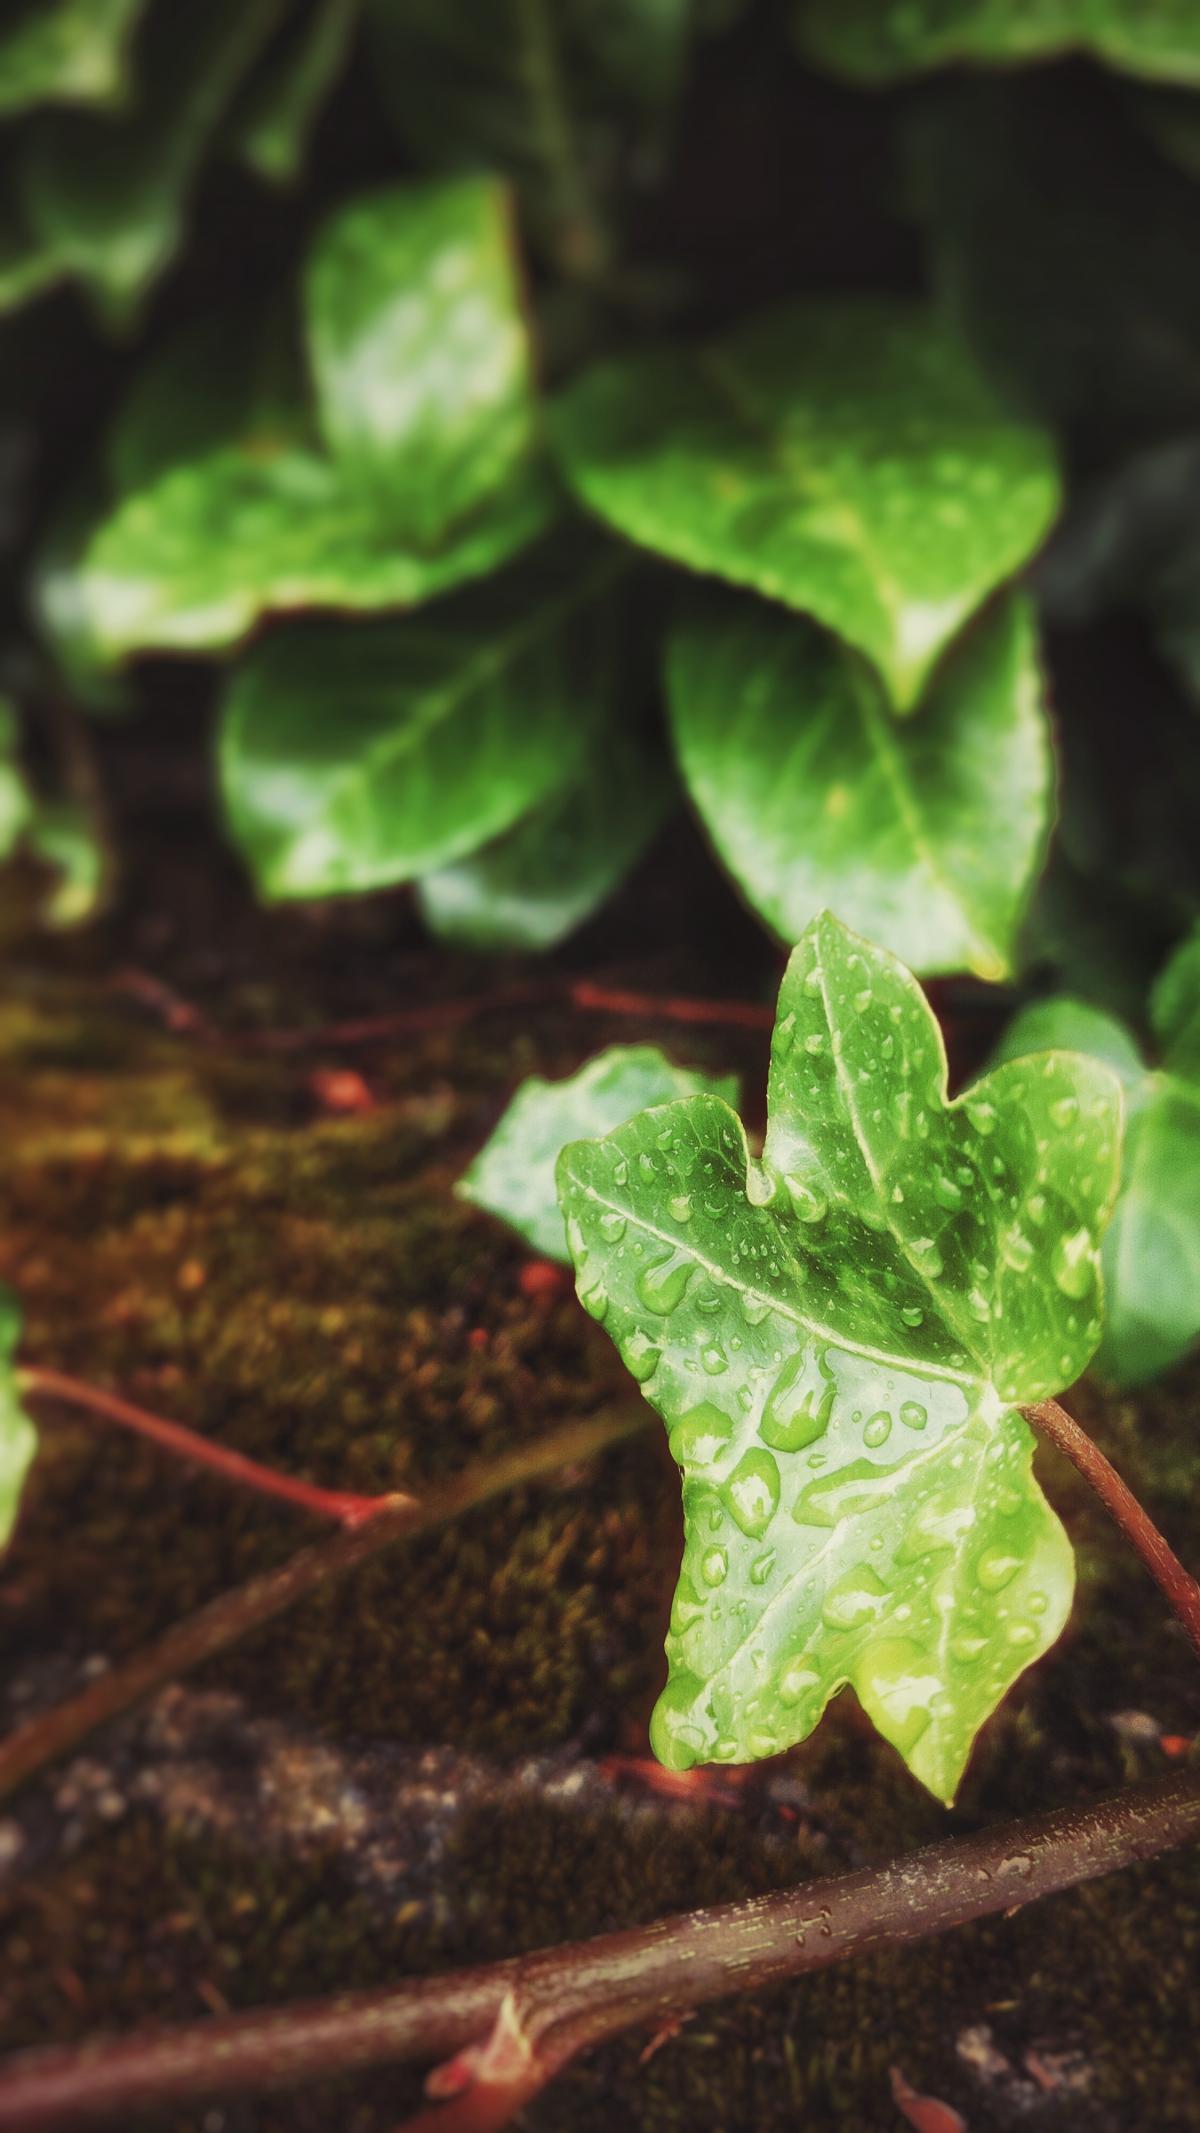 Greens Blattpflanze #175200